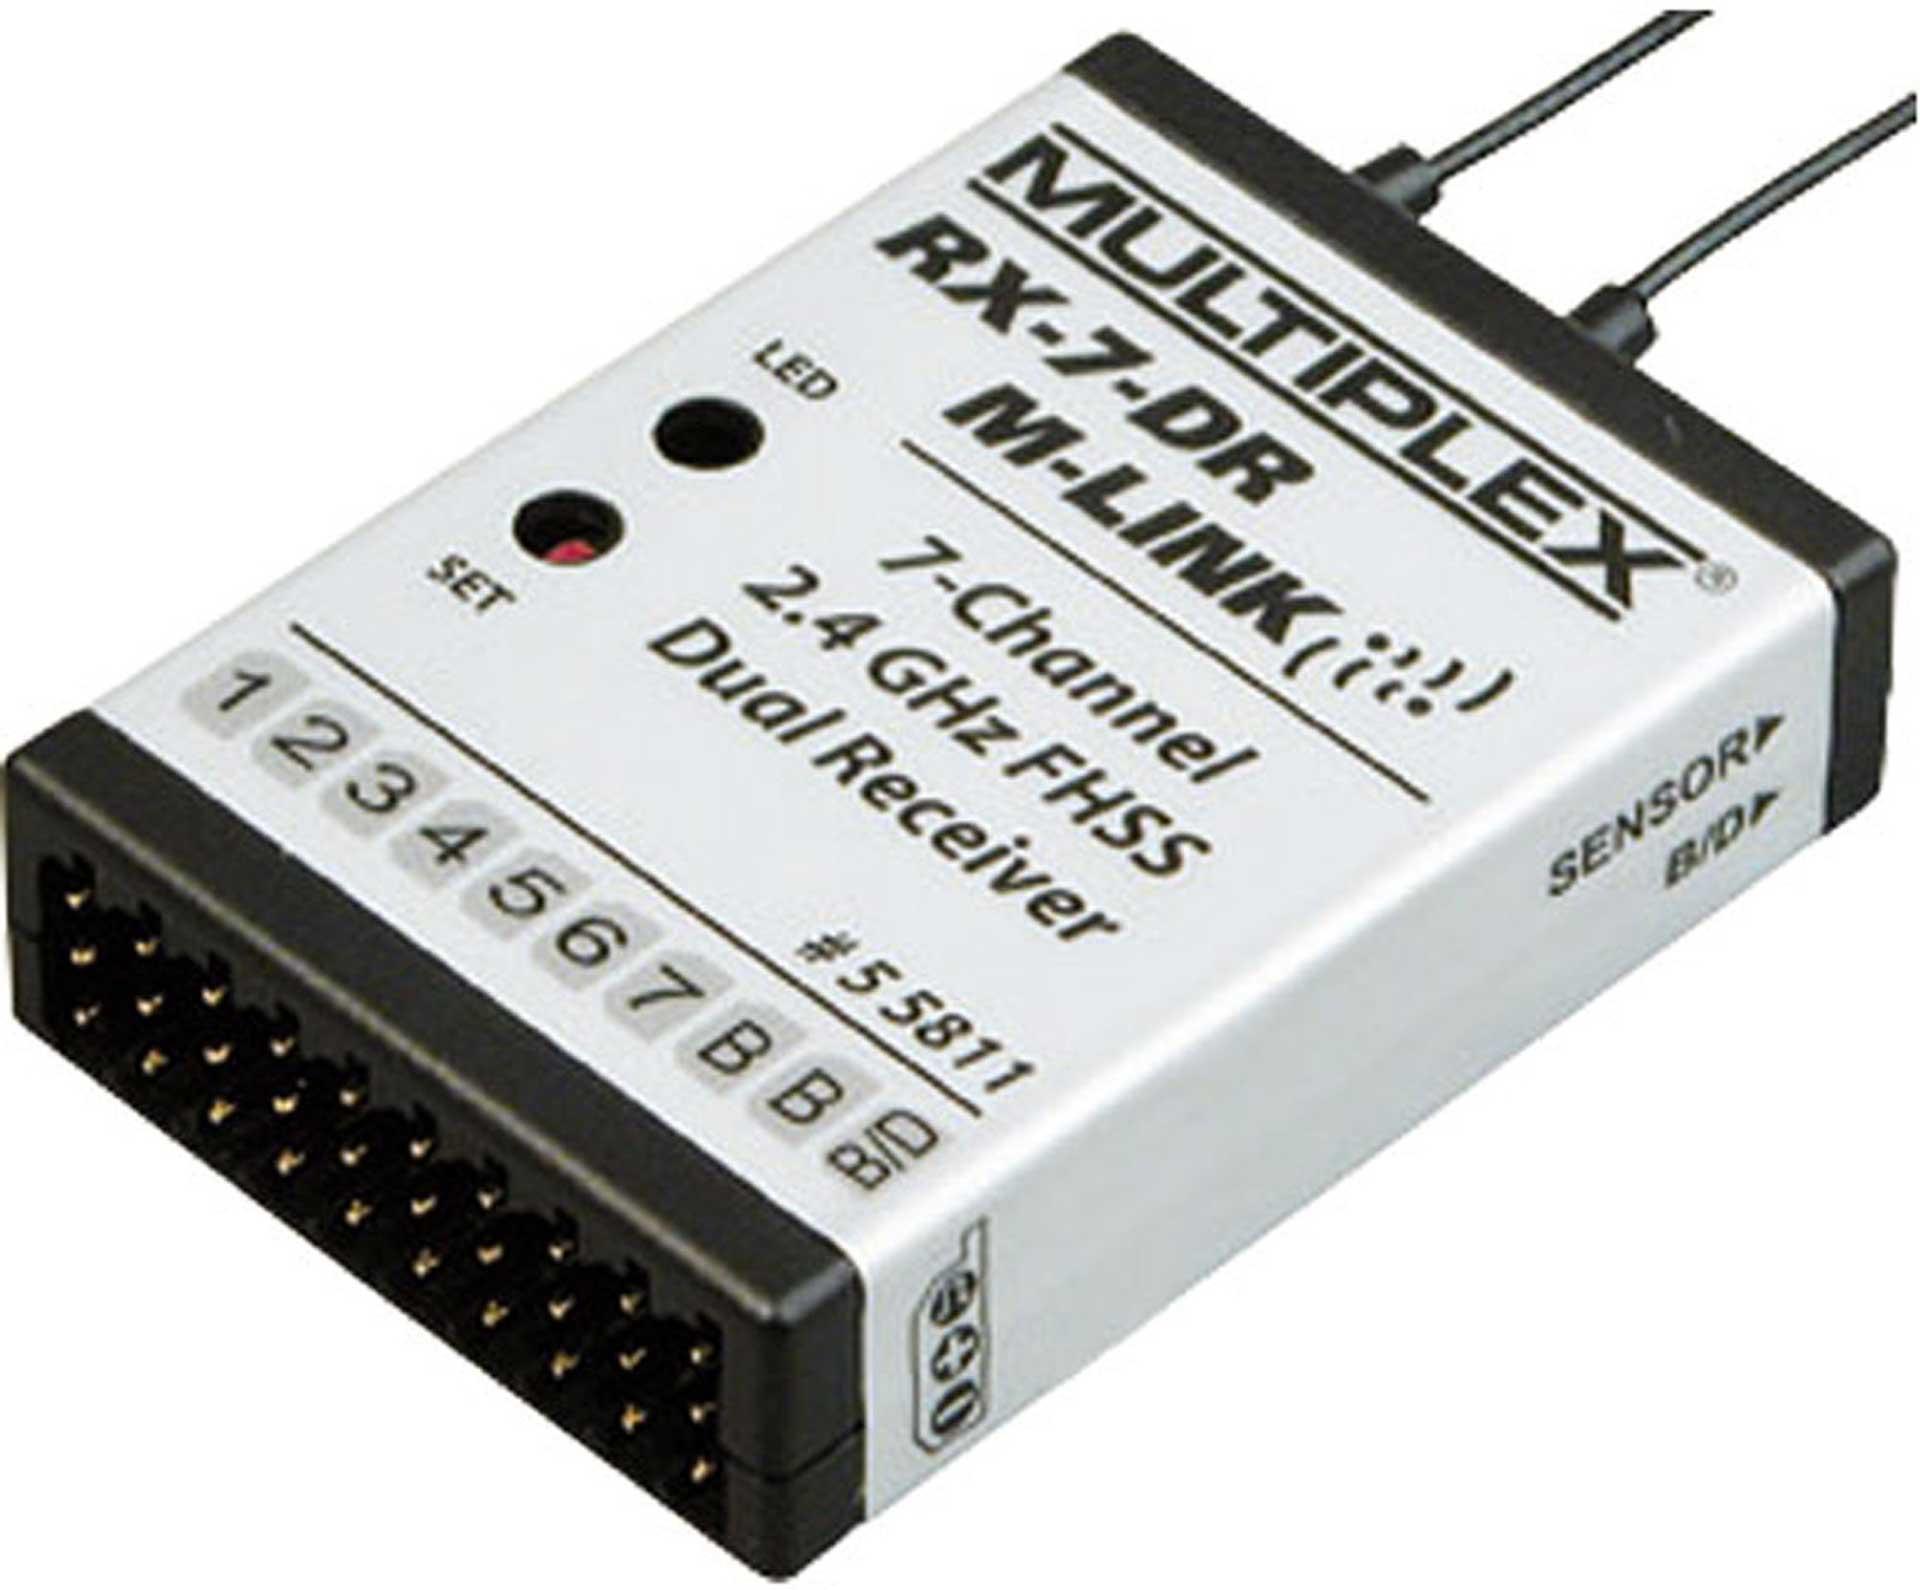 MULTIPLEX RX-7 DR 2,4GHZ M-LINK EMPFÄNGER MPX